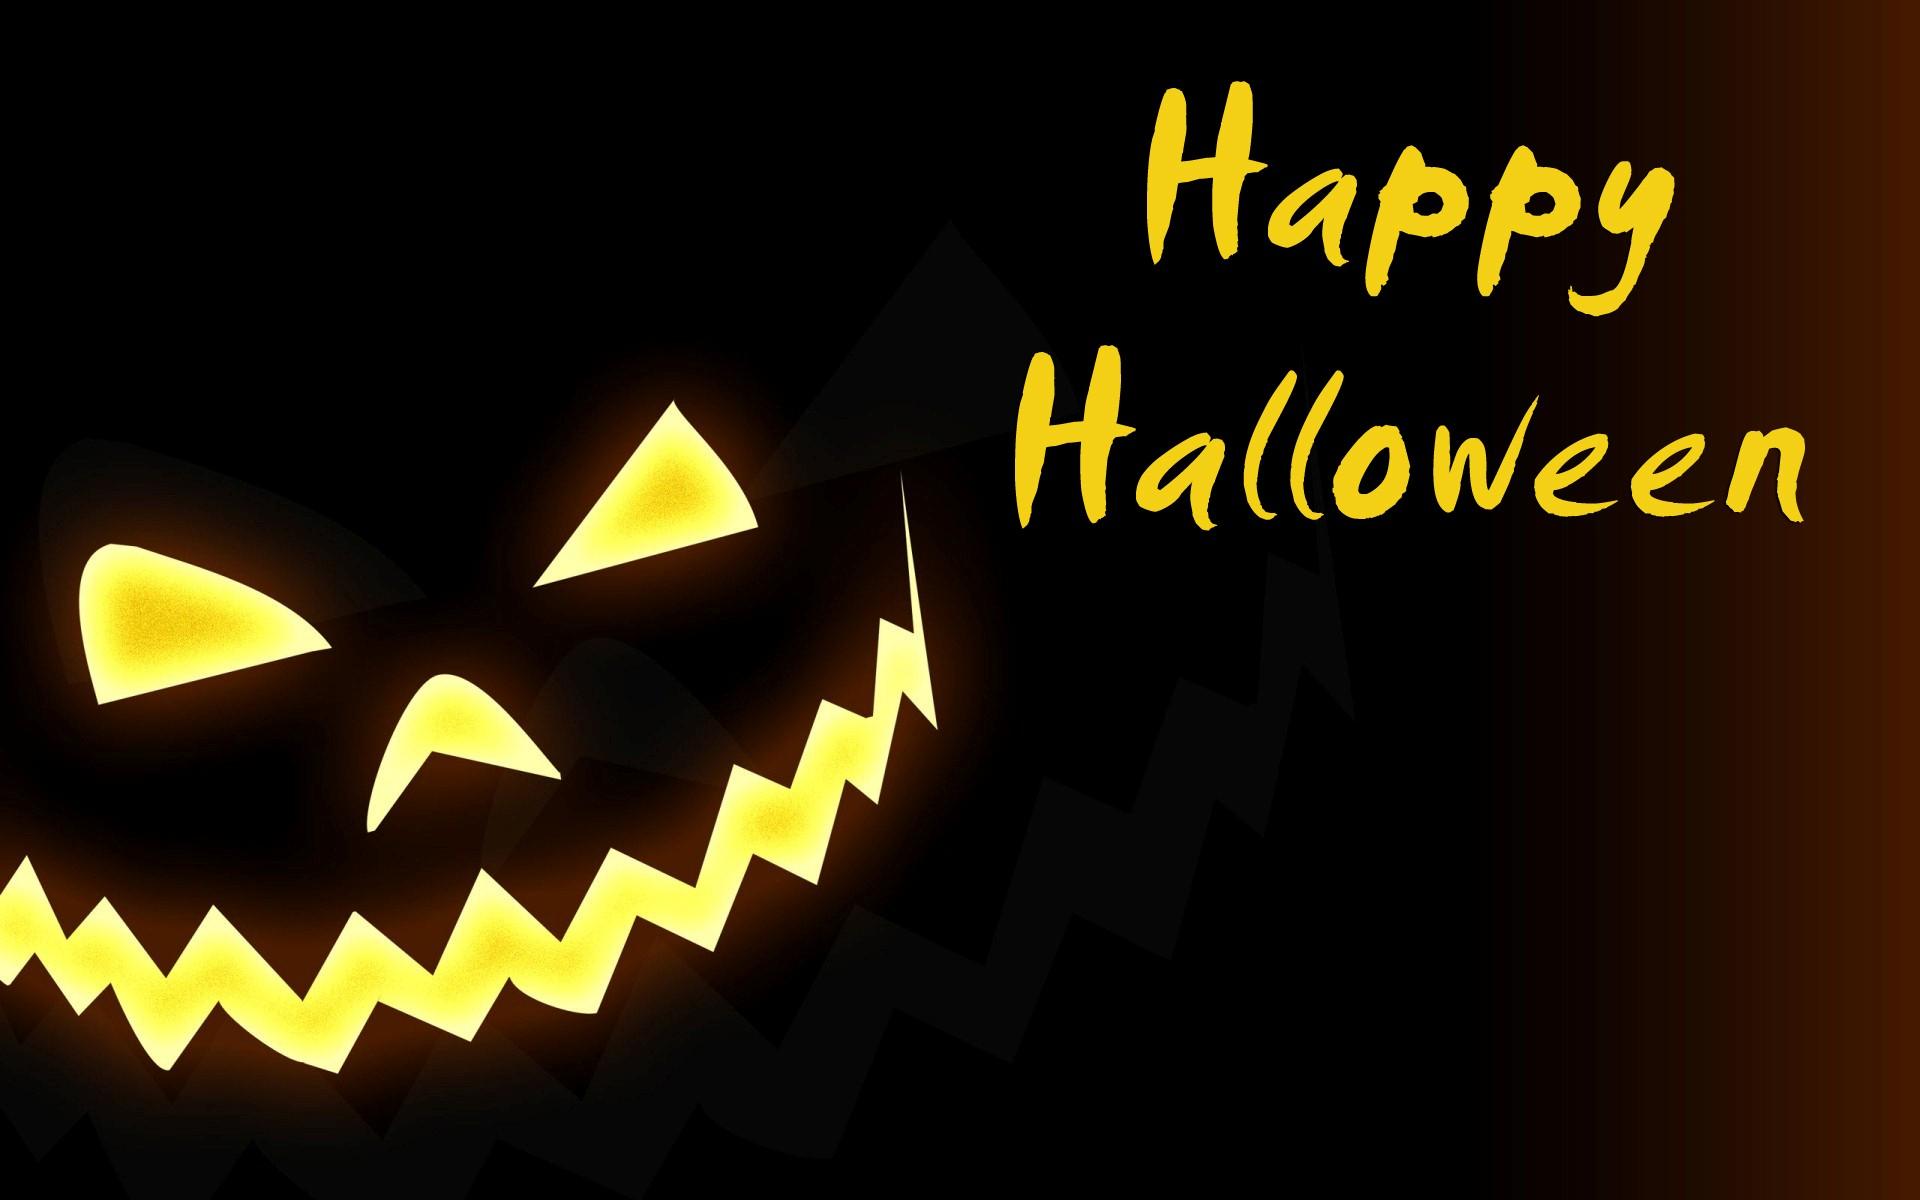 Happy halloween facebook banner 2016 fb latest banner hd 1920x1200